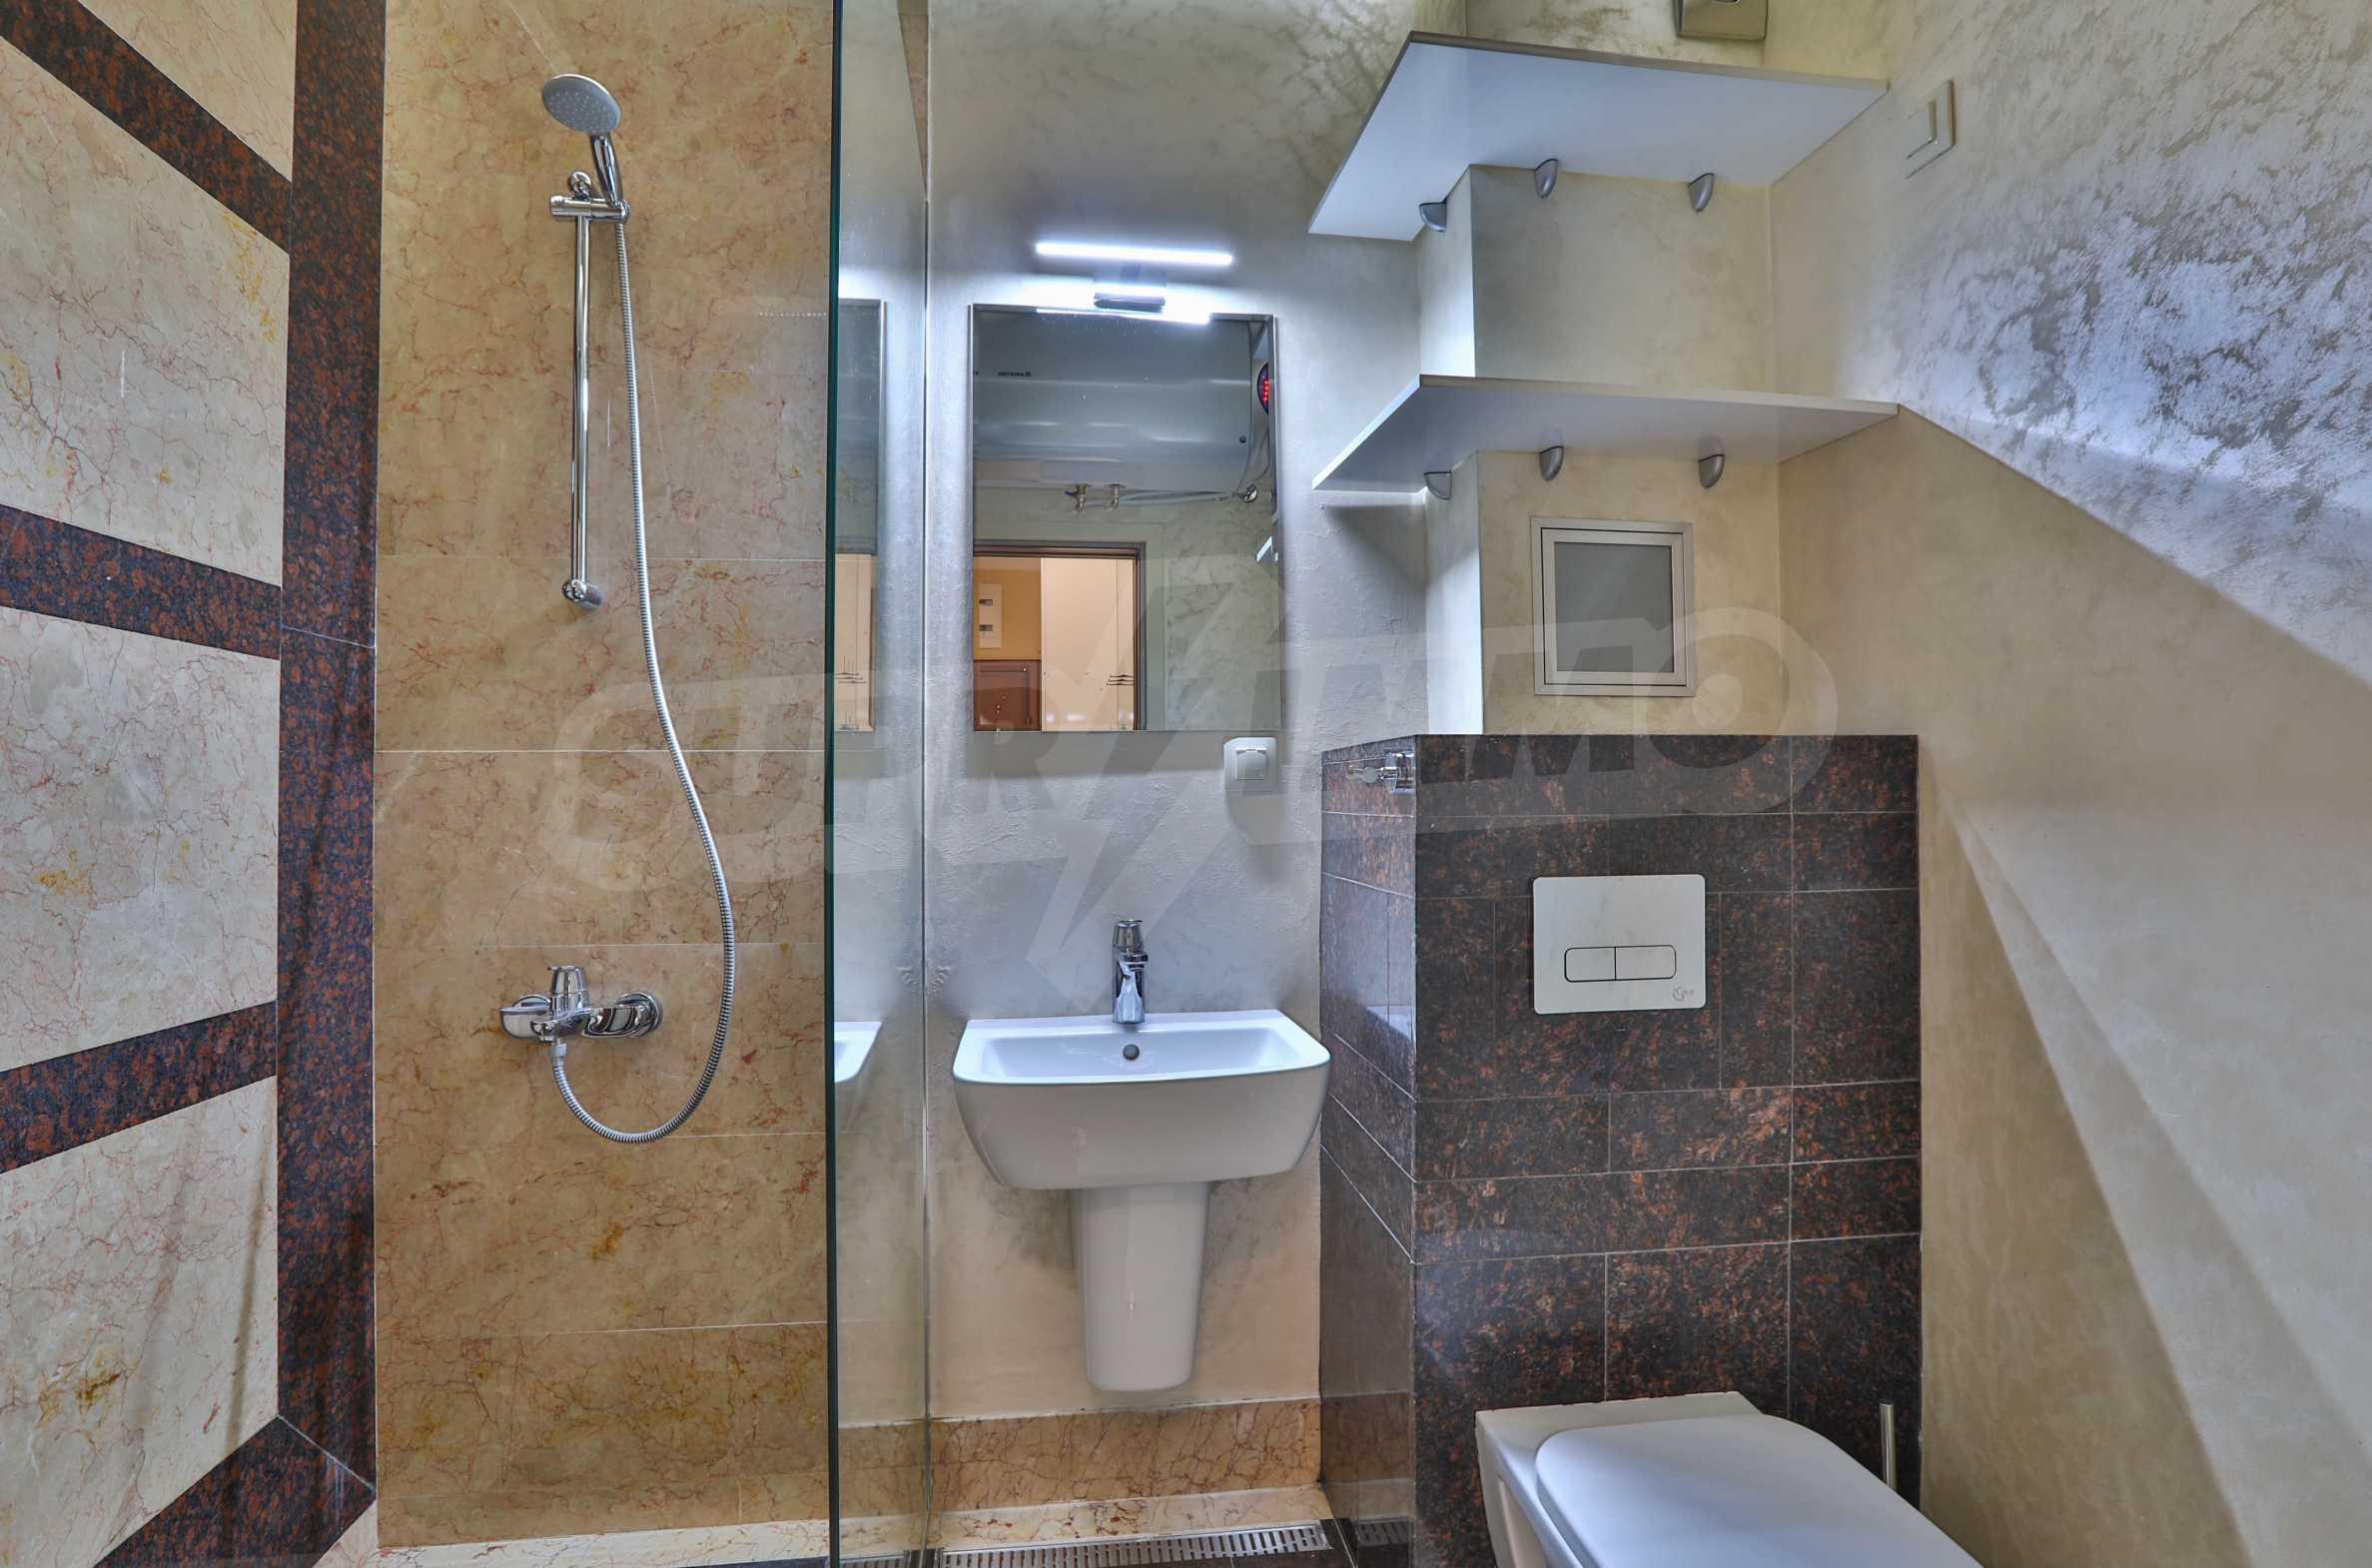 Дизайнерски тристаен апартамент под наем за летен сезон в резиденция Belle Époque в Лозенец 22